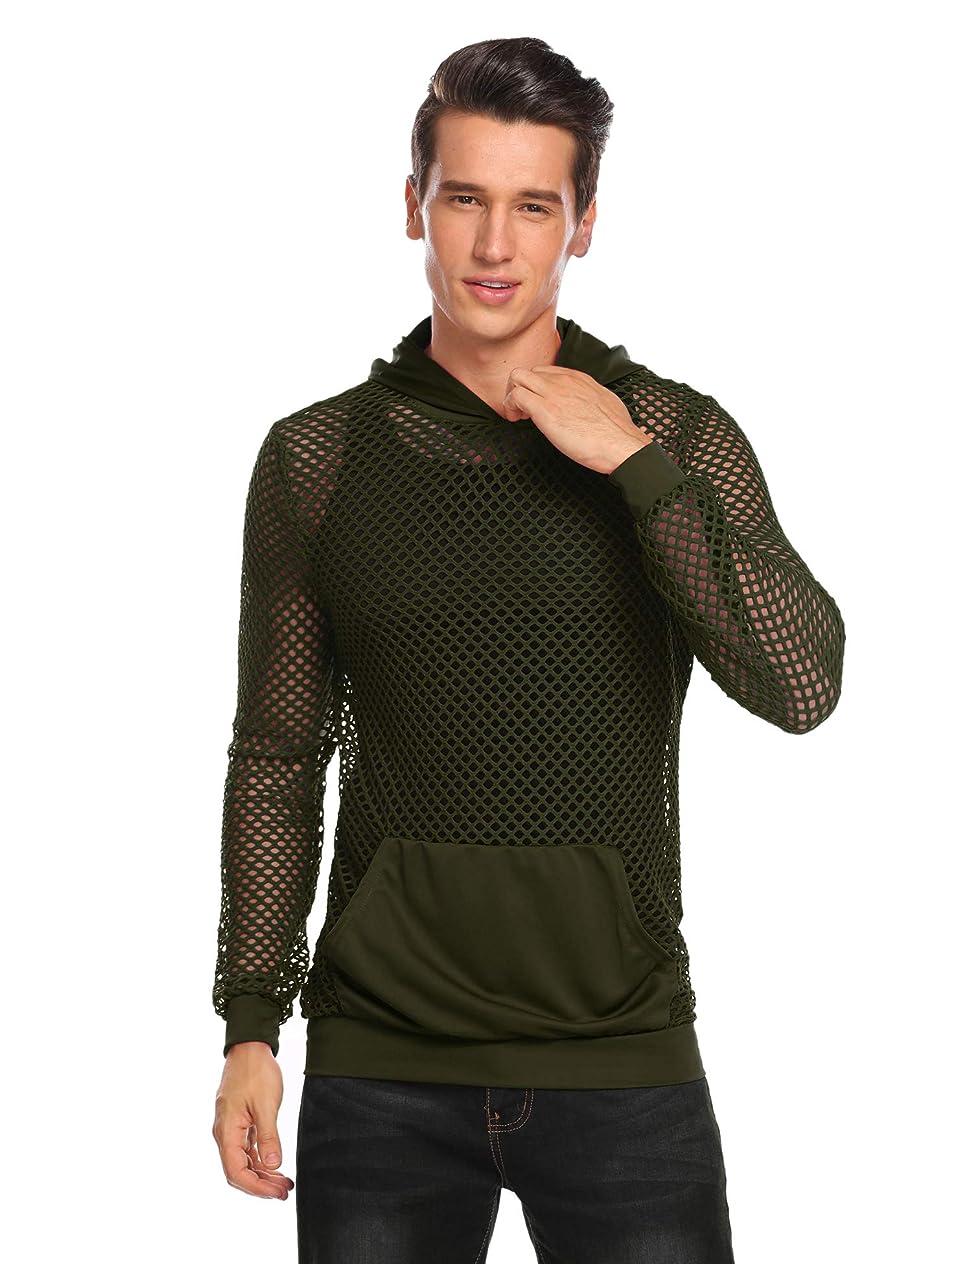 COOFANDY Mens Workout Tank Fishnet Muscle See Through T Shirt Sexy Mesh Transparent Tees Top drttrsmq468